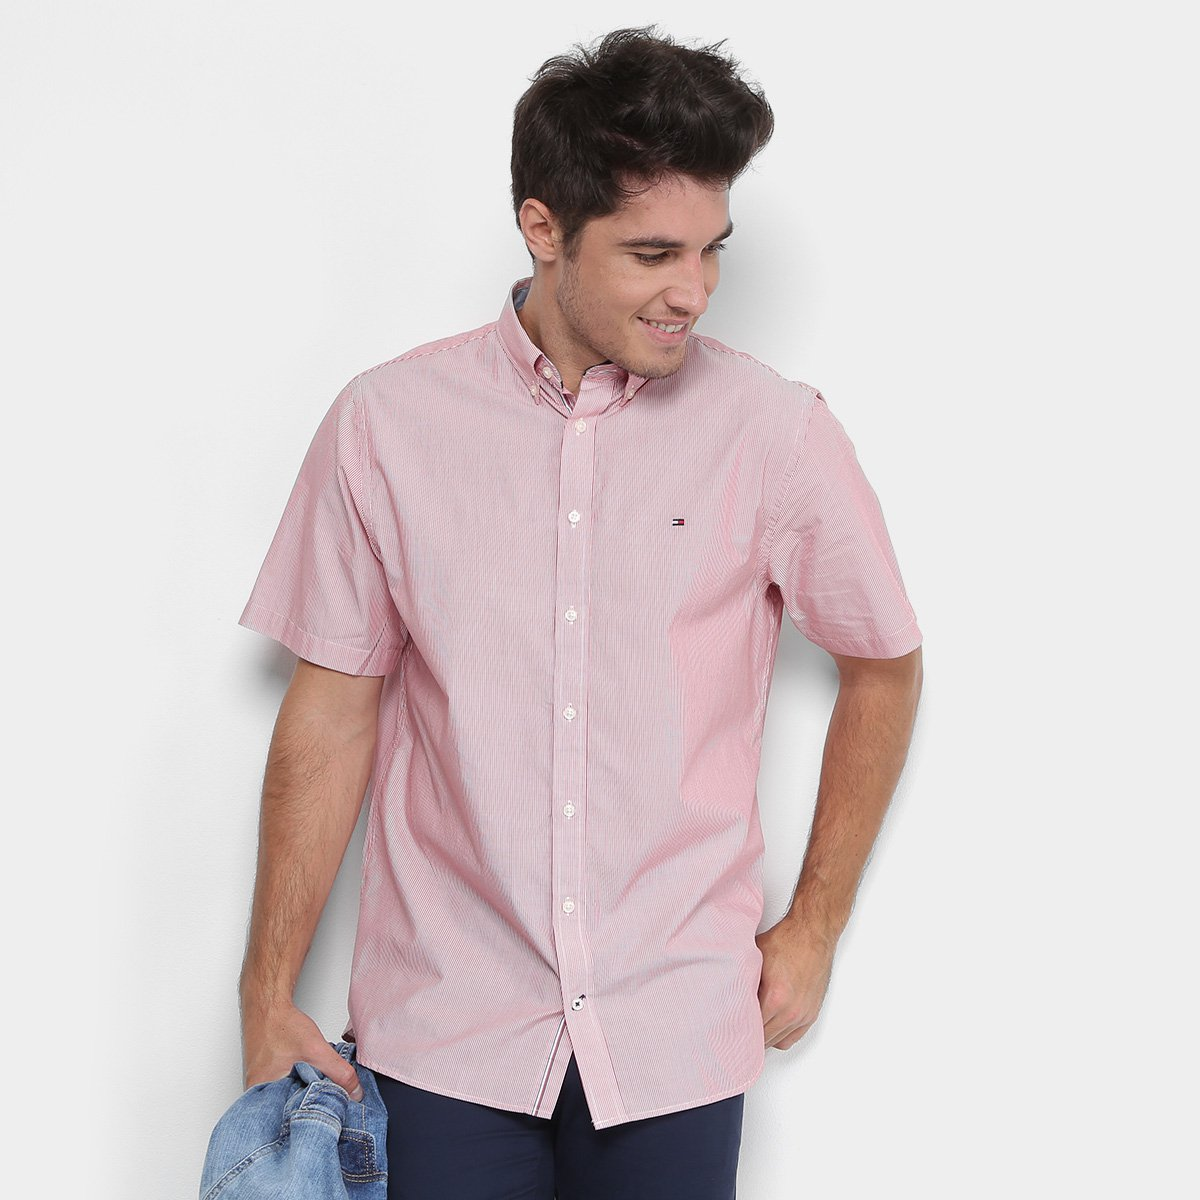 Camisa Tommy Hilfiger Manga Curta Regular Fit Masculina - Compre Agora  cf528ec3c42